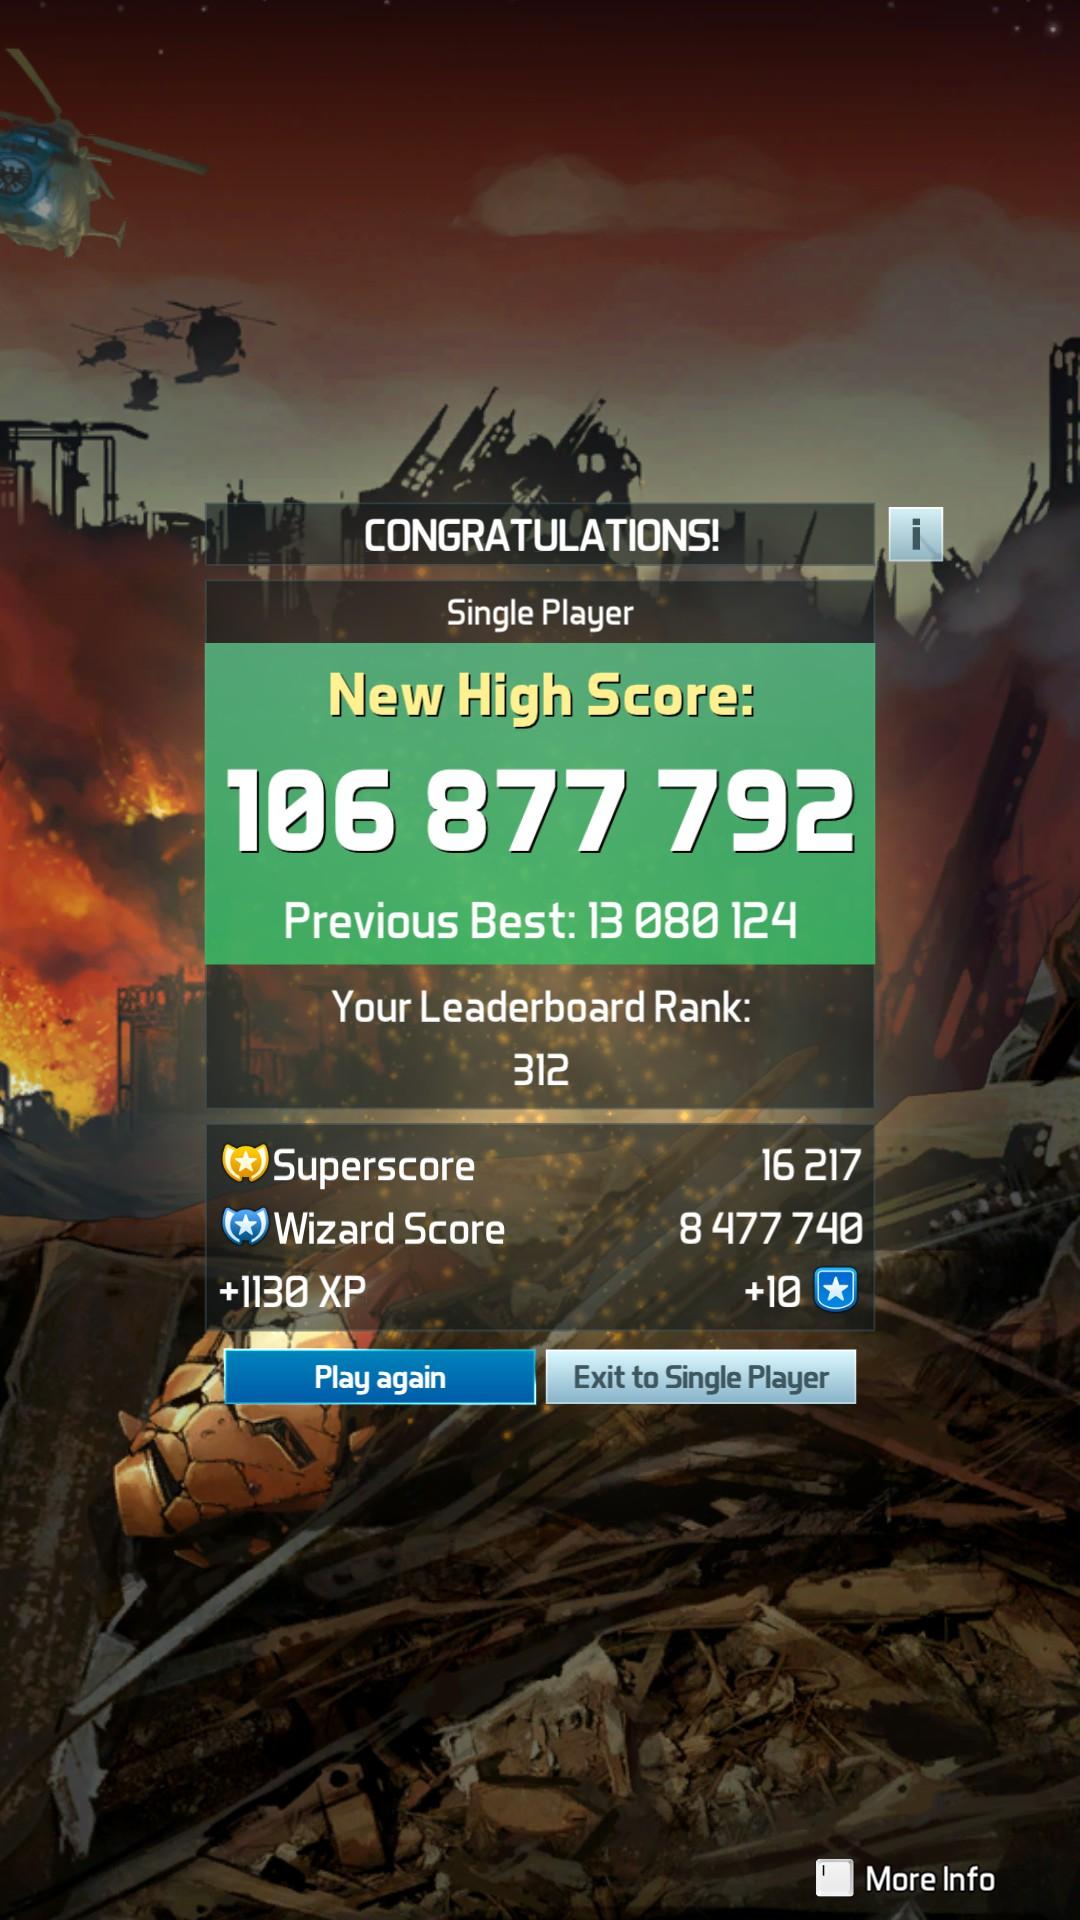 Pinball FX3: Civil War 106,877,792 points